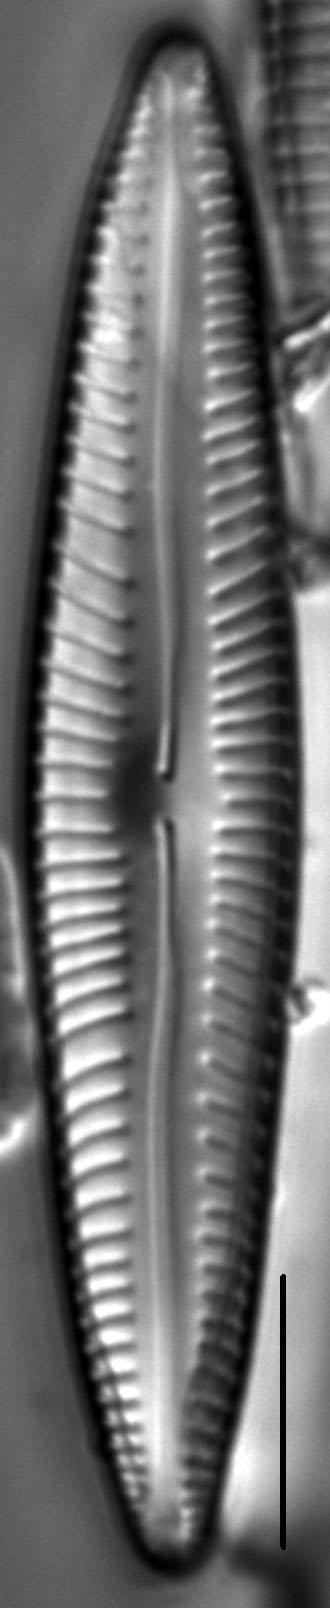 Encyonopsis Stodderi 5